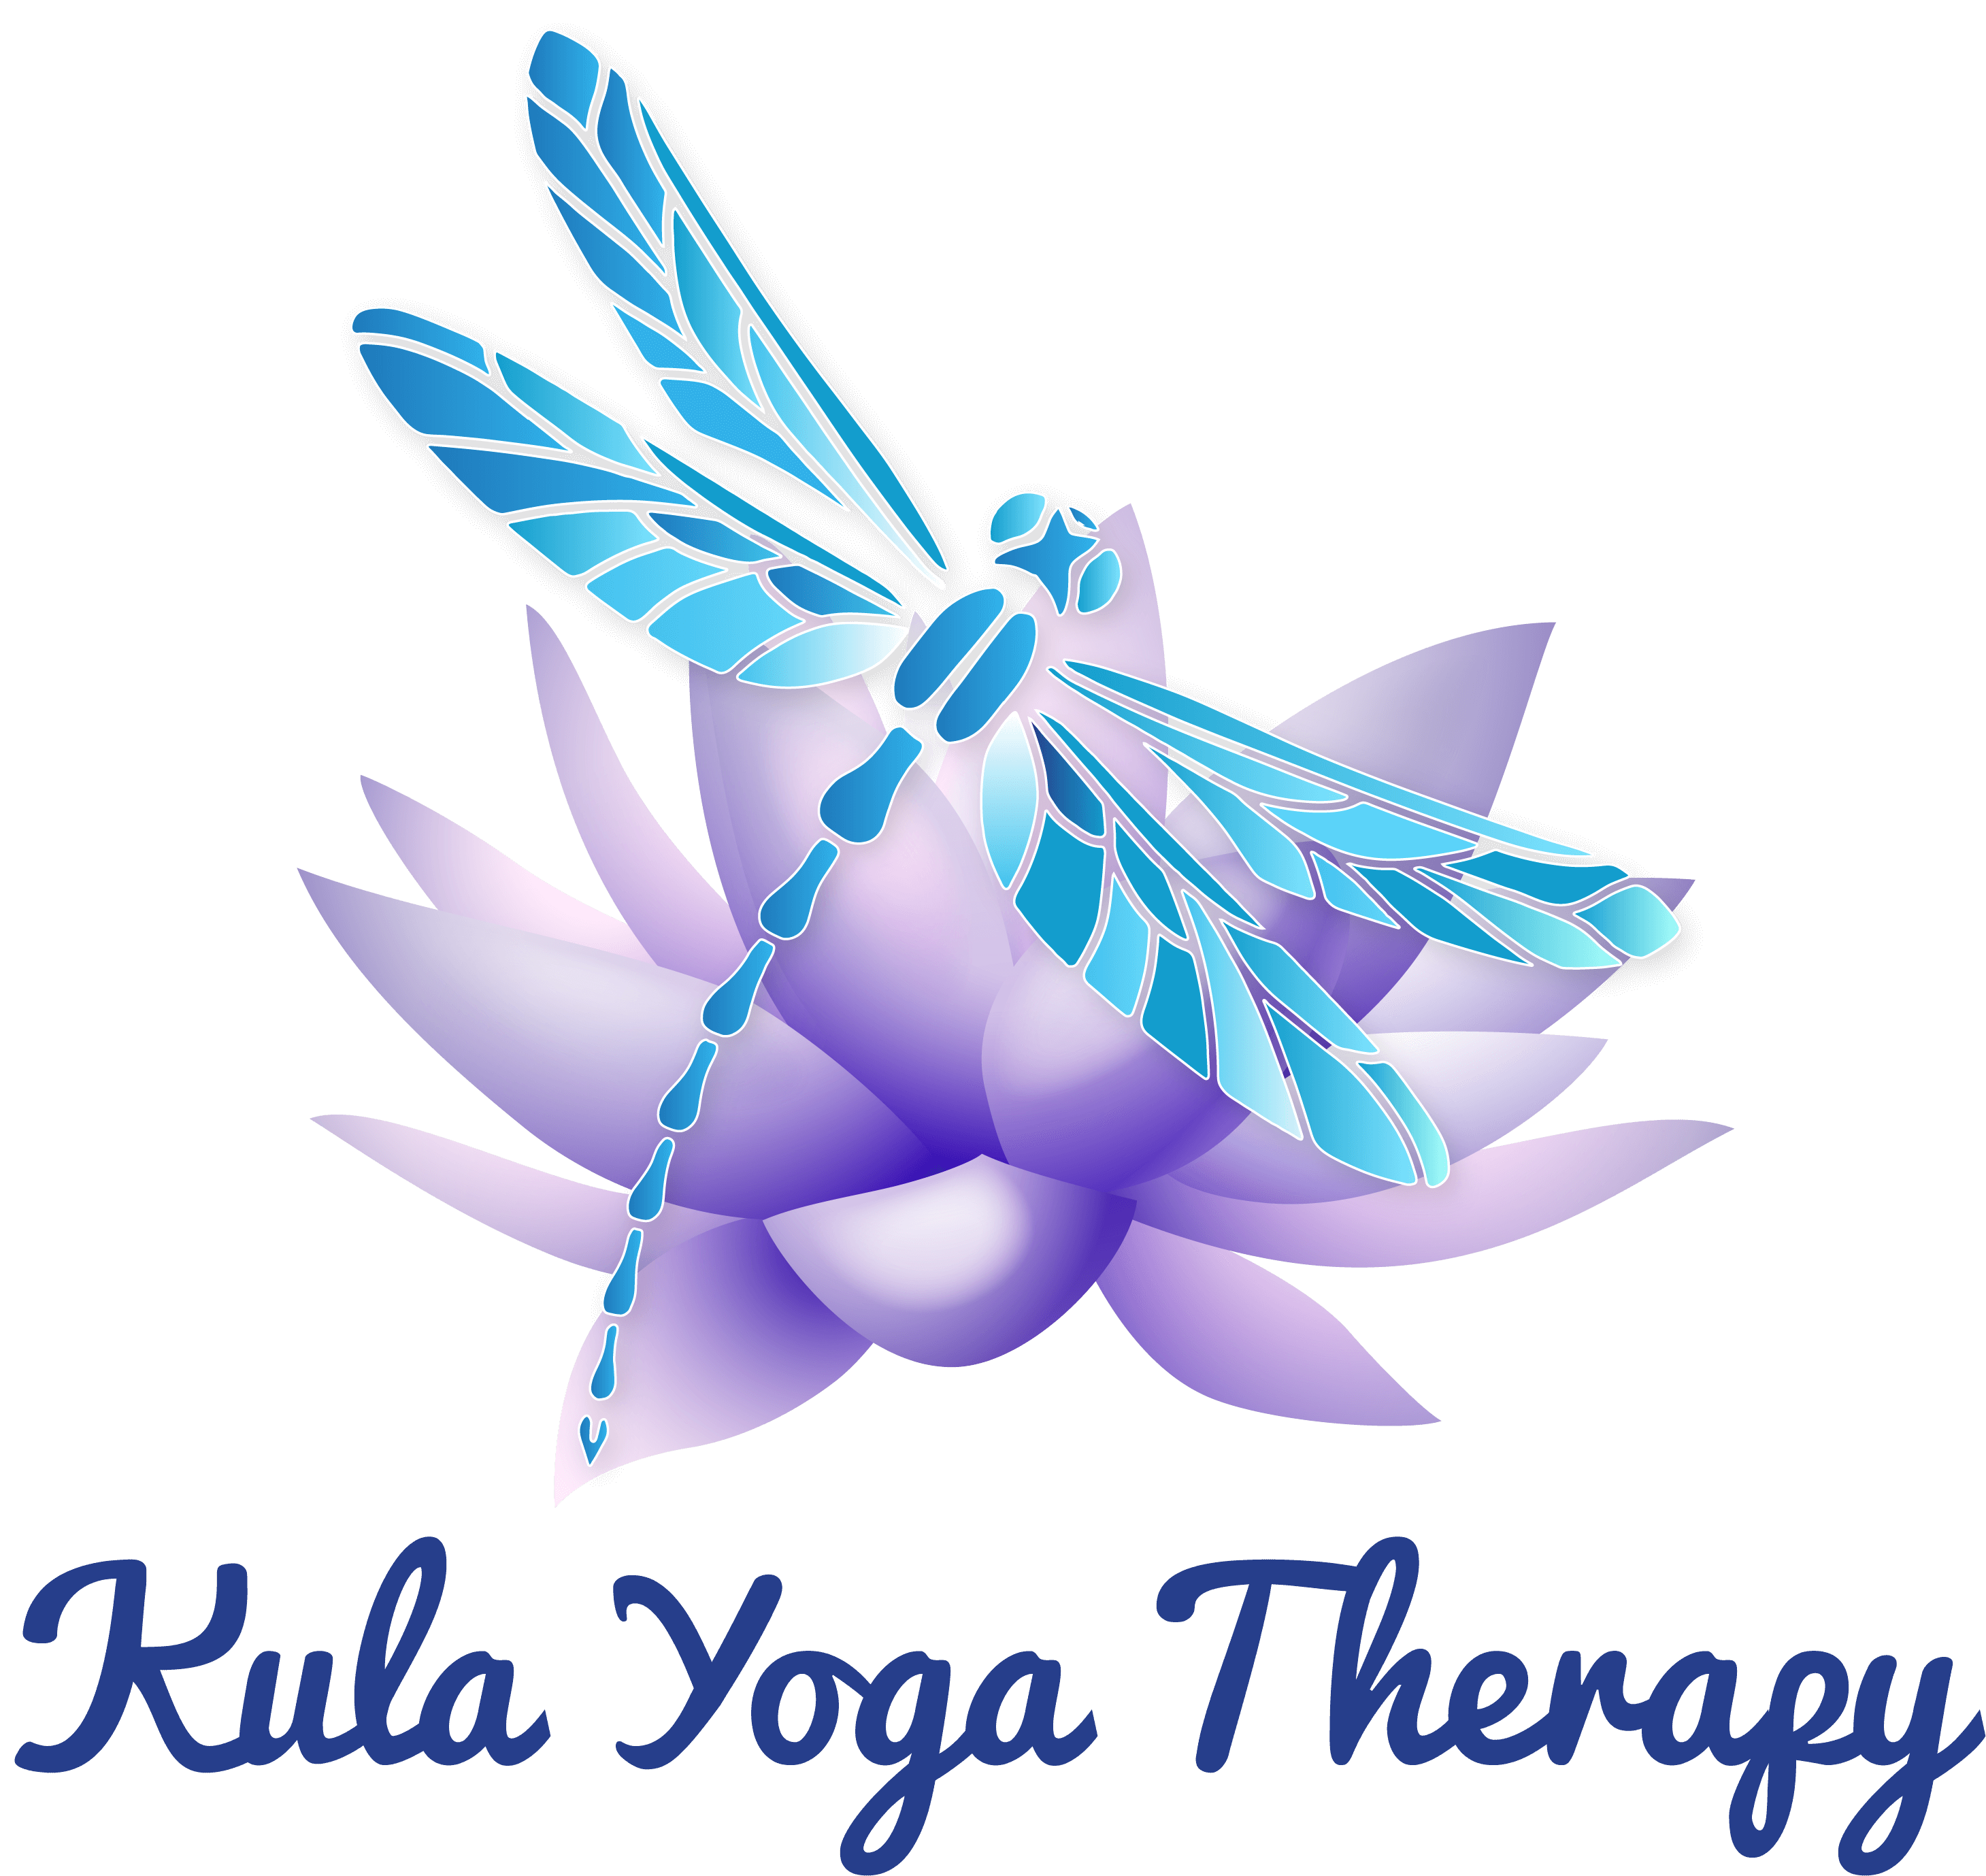 Kula Yoga Therapy